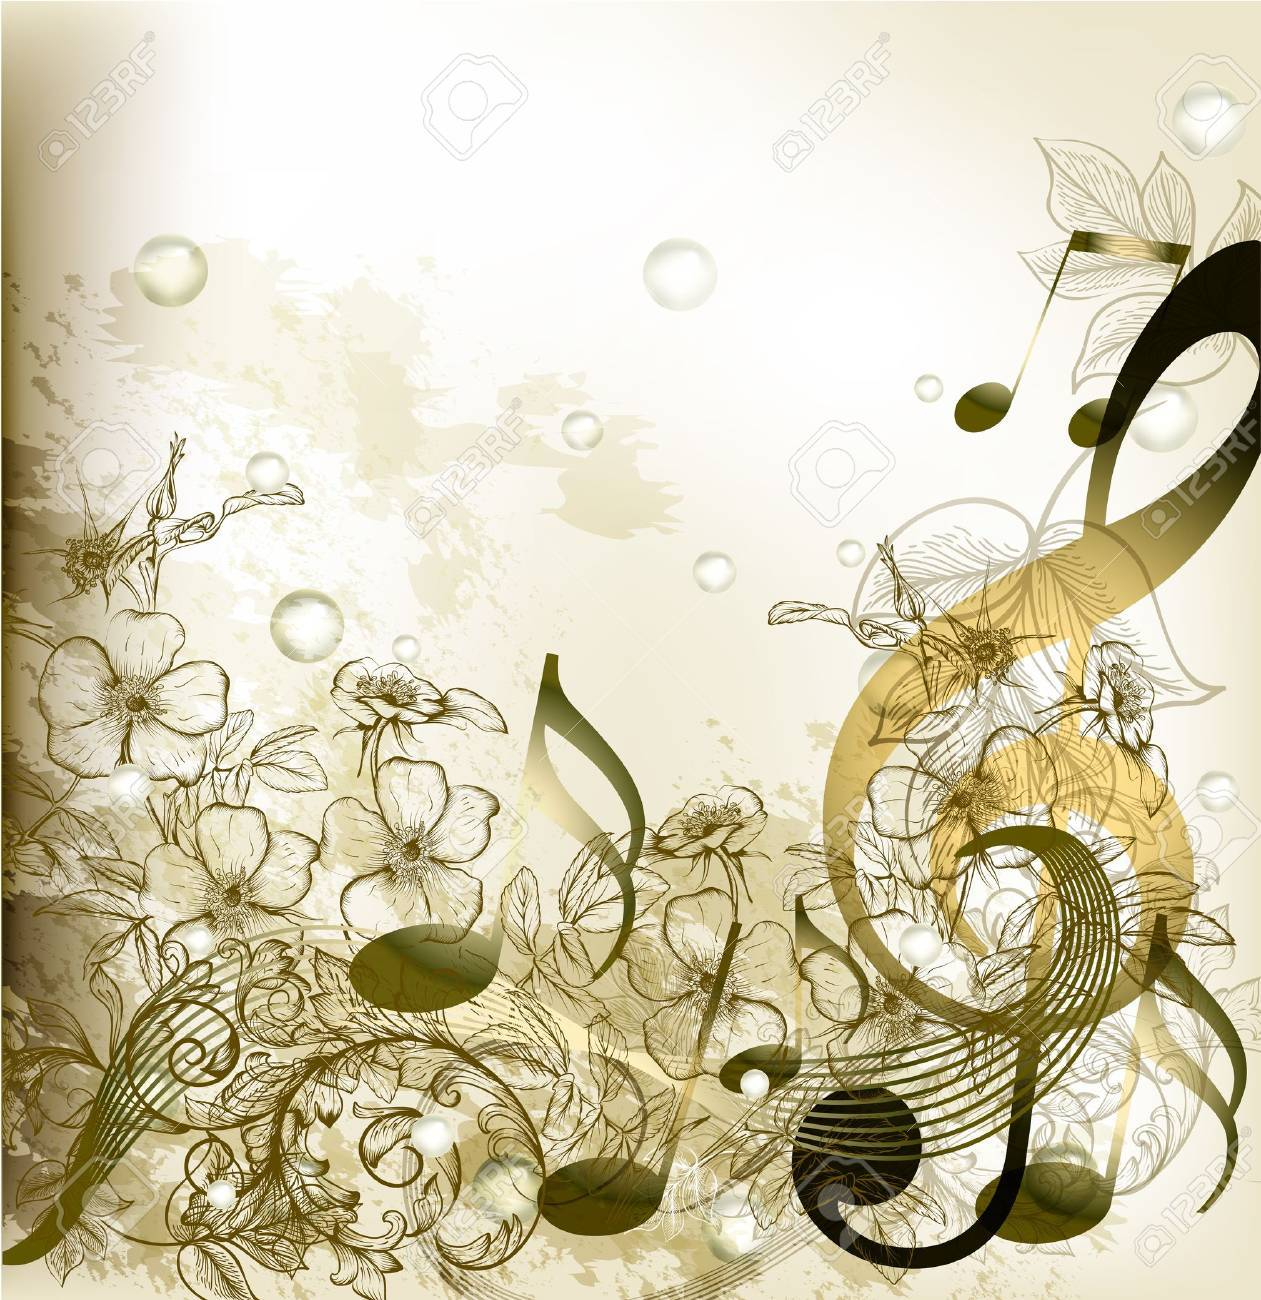 music conceptual background Stock Vector - 17775177